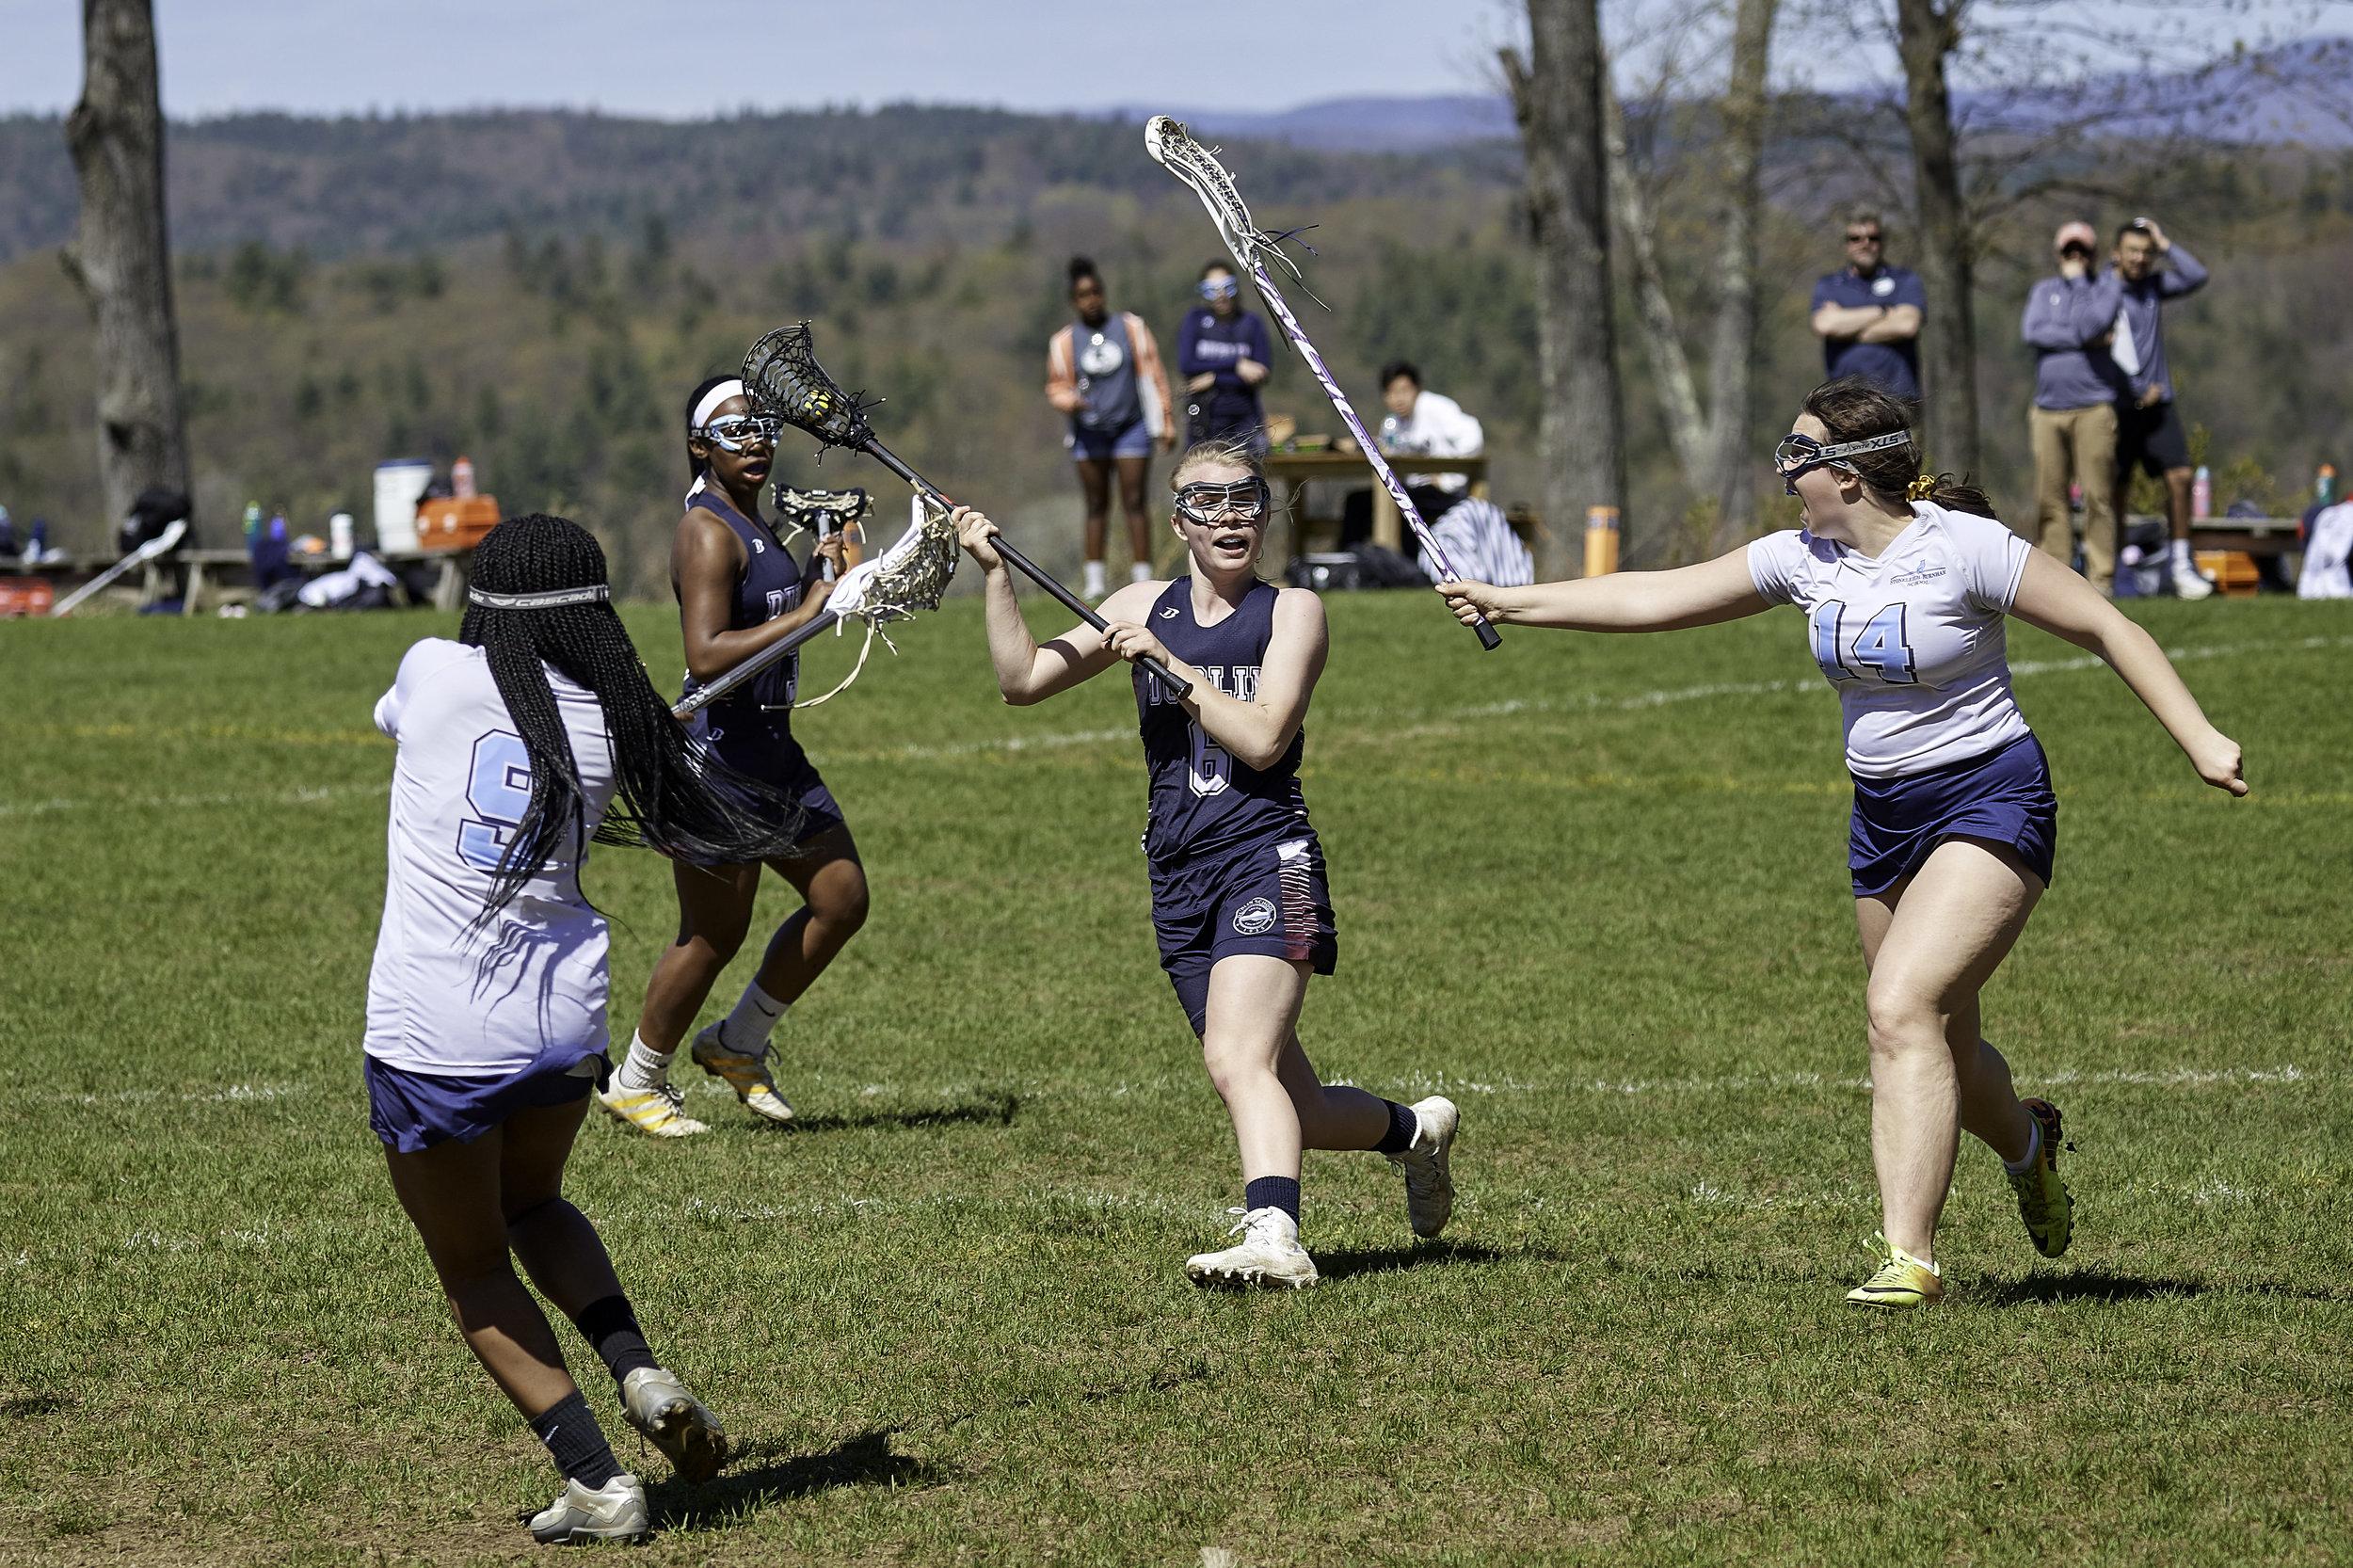 Girls Lacrosse vs. Stoneleigh Burnham School - May 11, 2019 - May 10, 2019193362.jpg